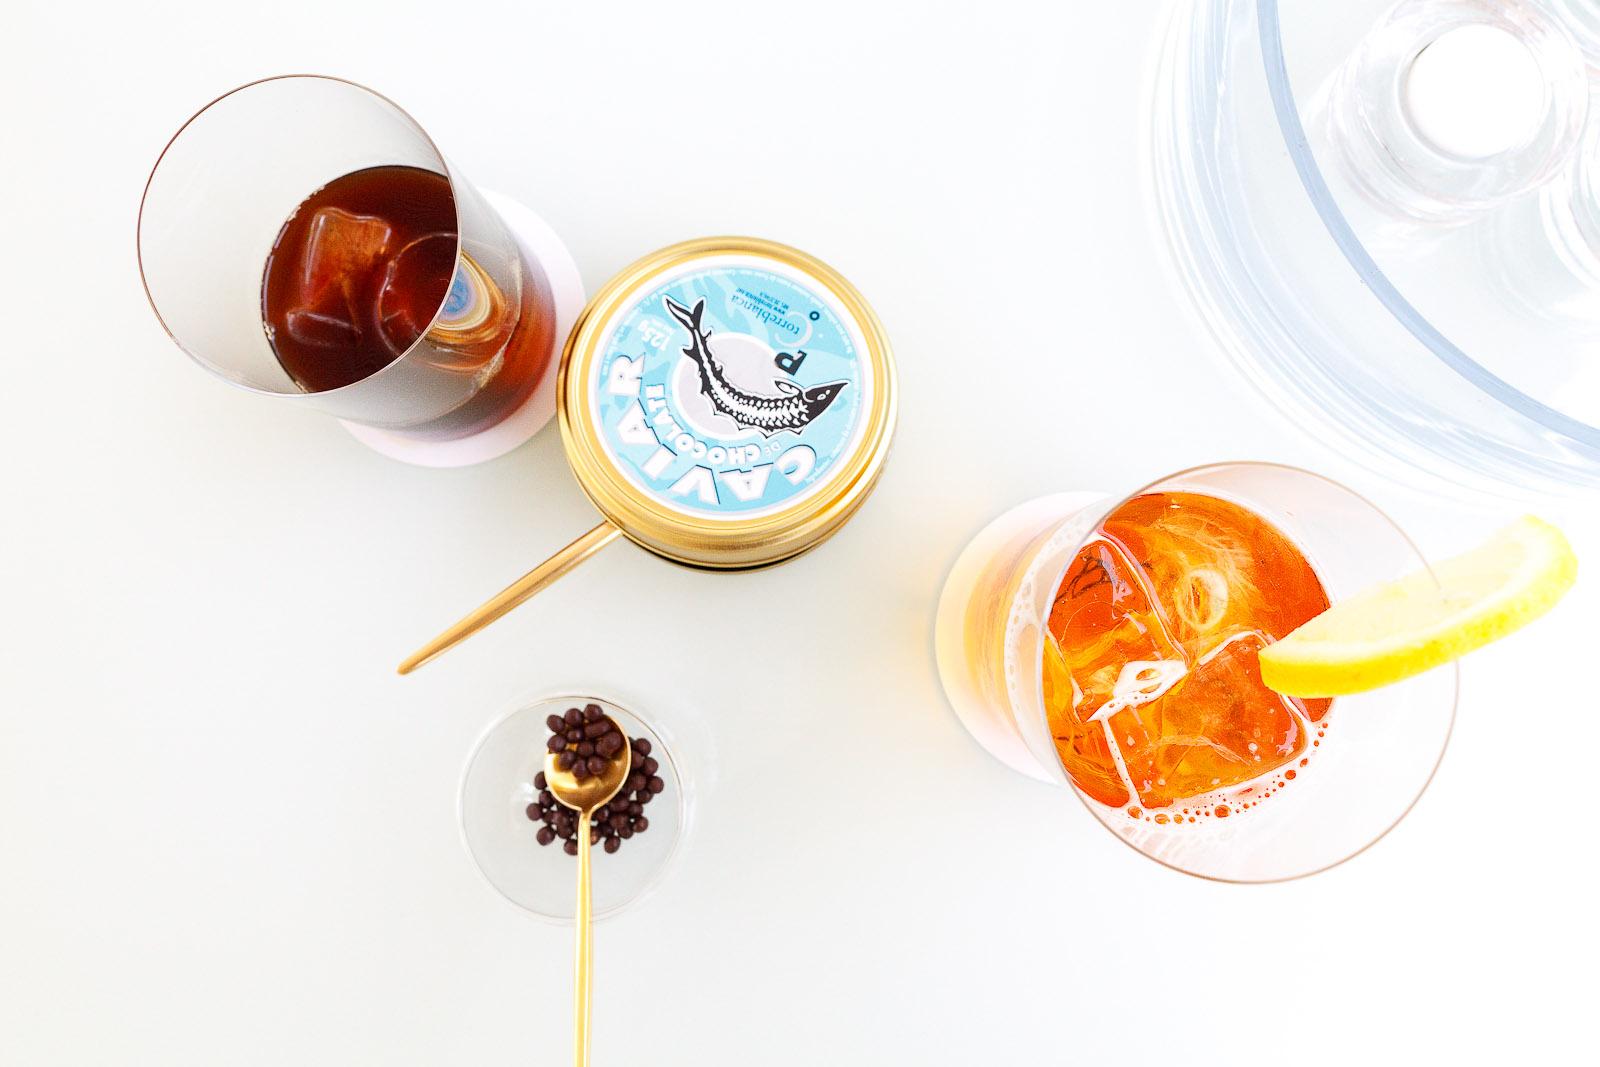 Petits Fours: Chocolate caviar, iced tea, iced coffee